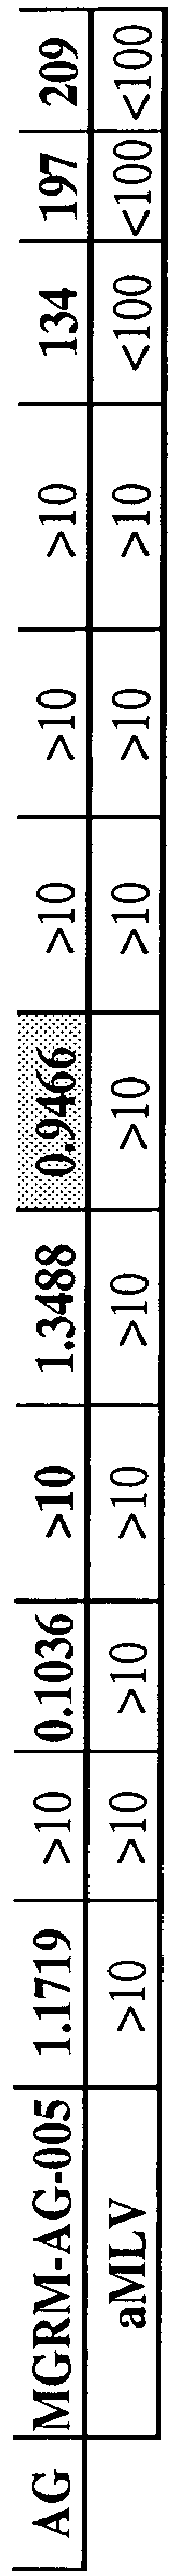 Figure imgb0490